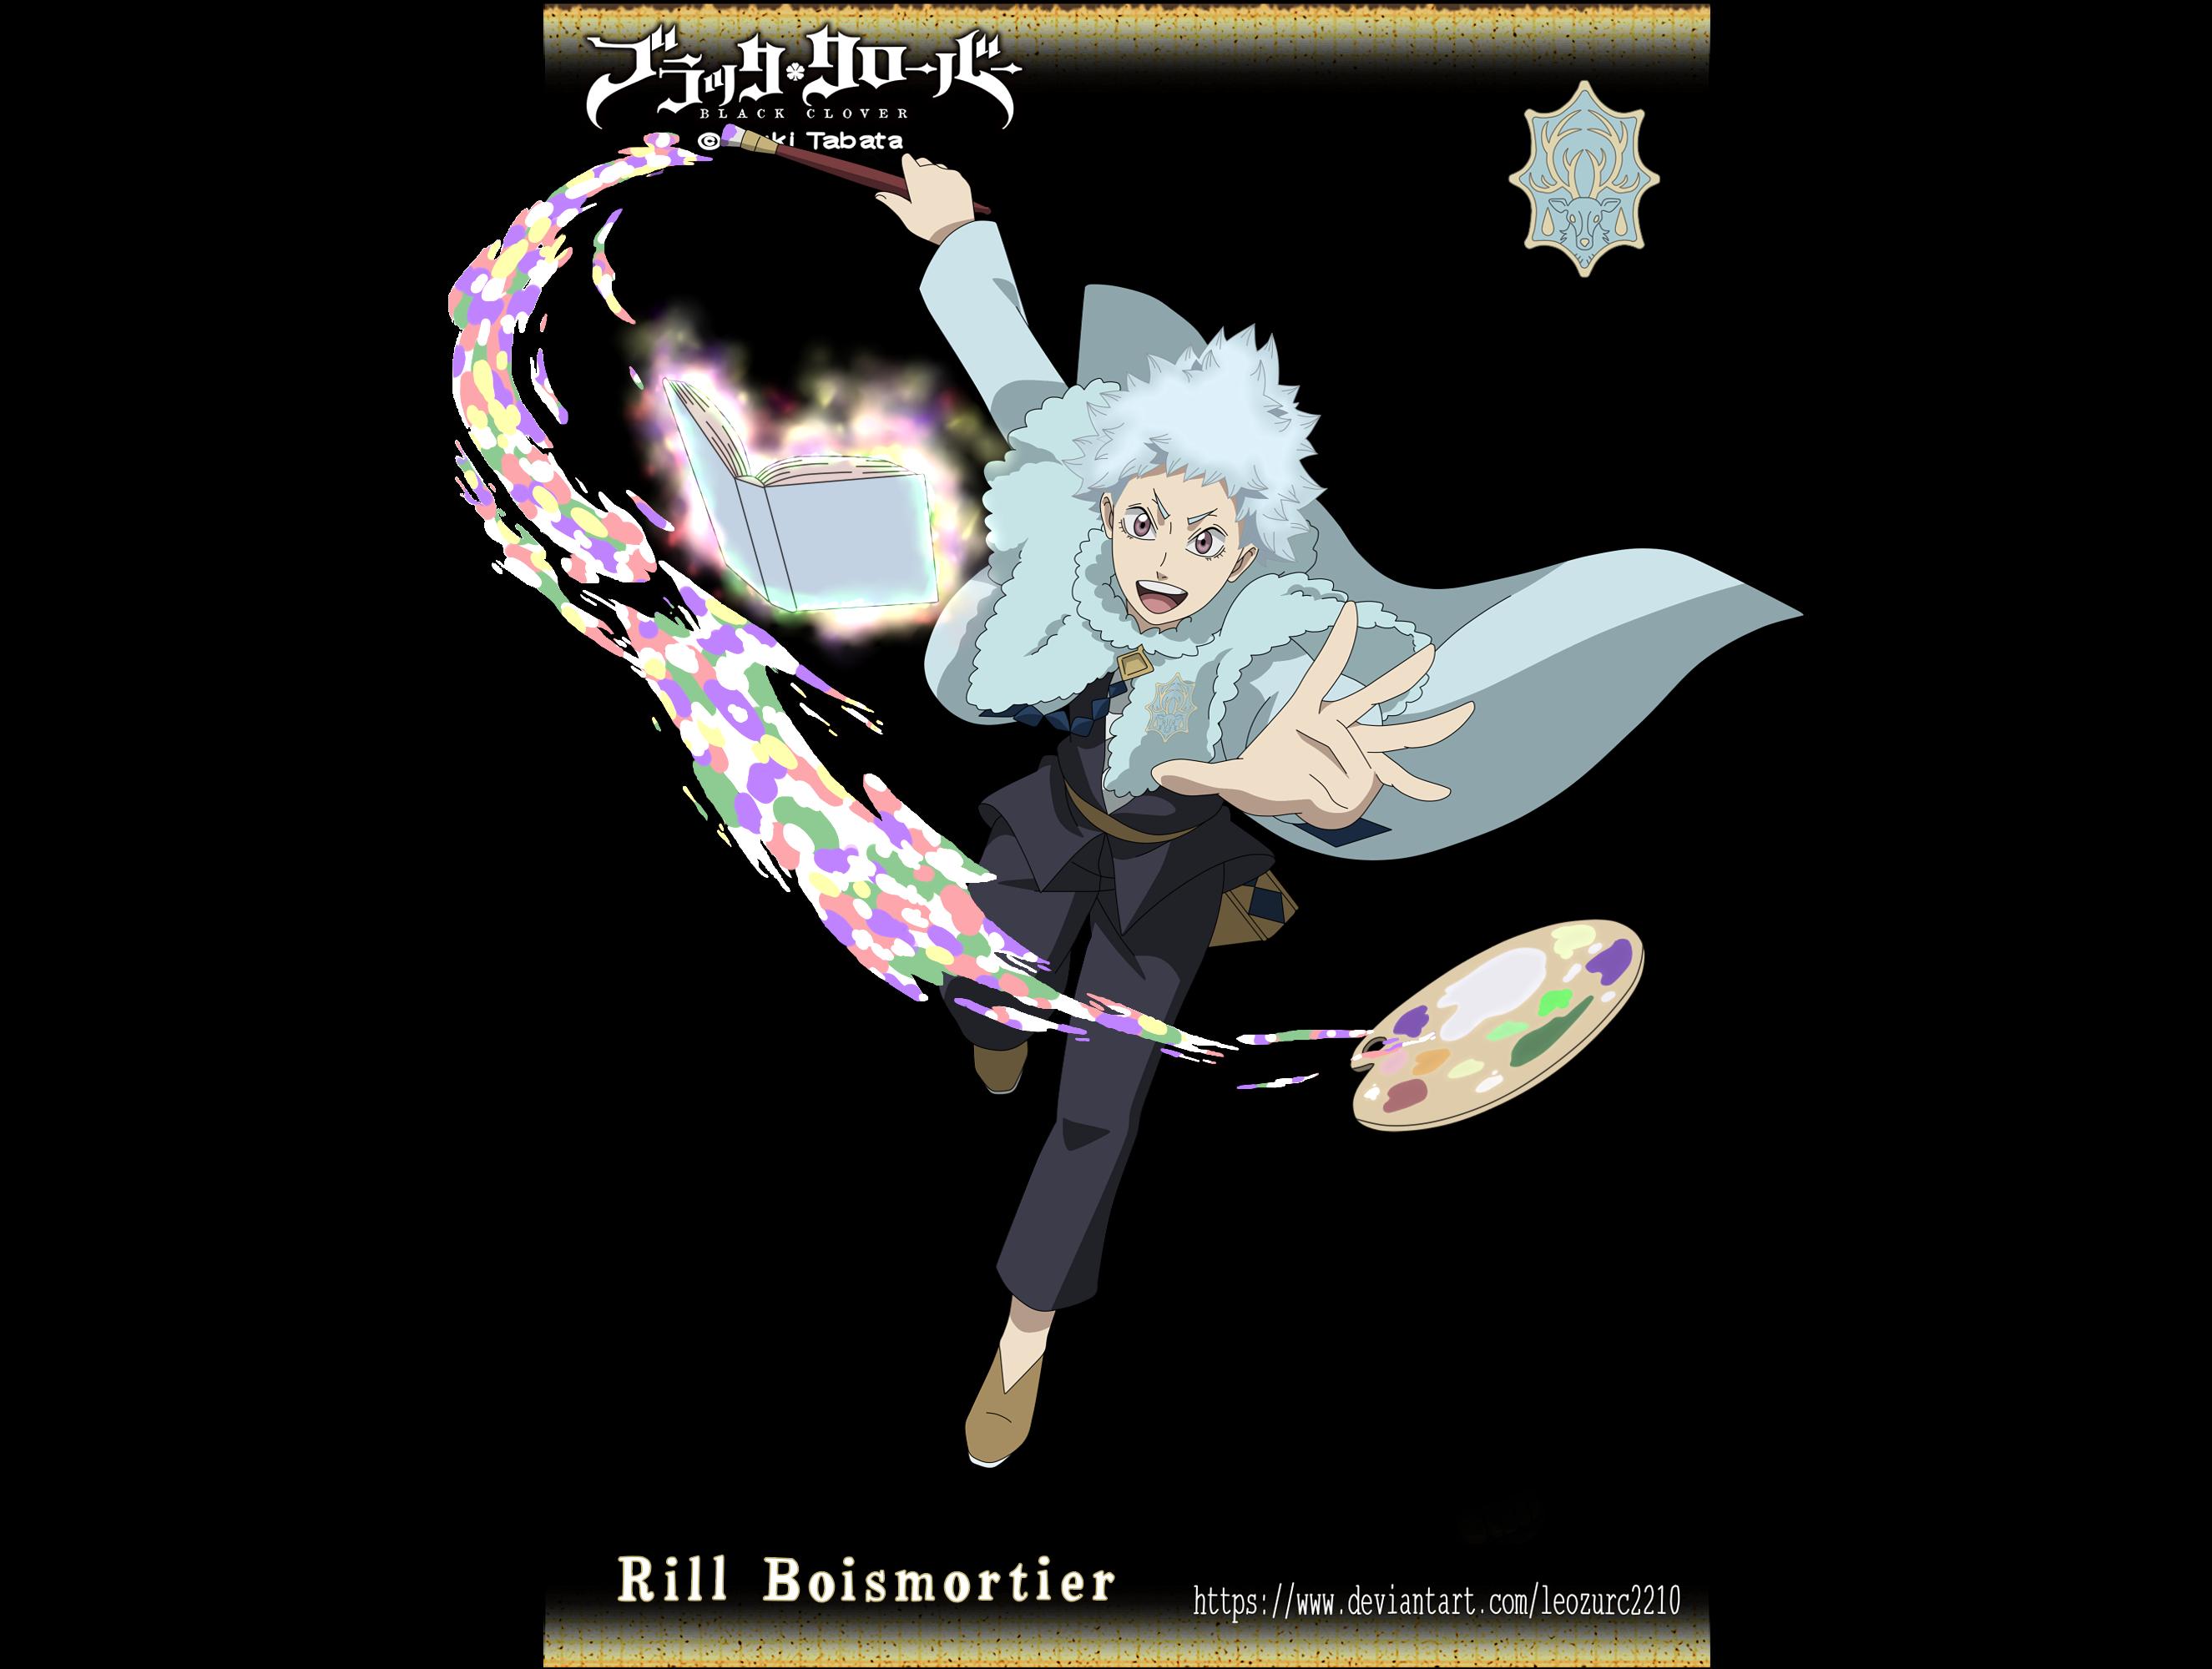 Rill Boismortier By Leozurc2210 On Deviantart